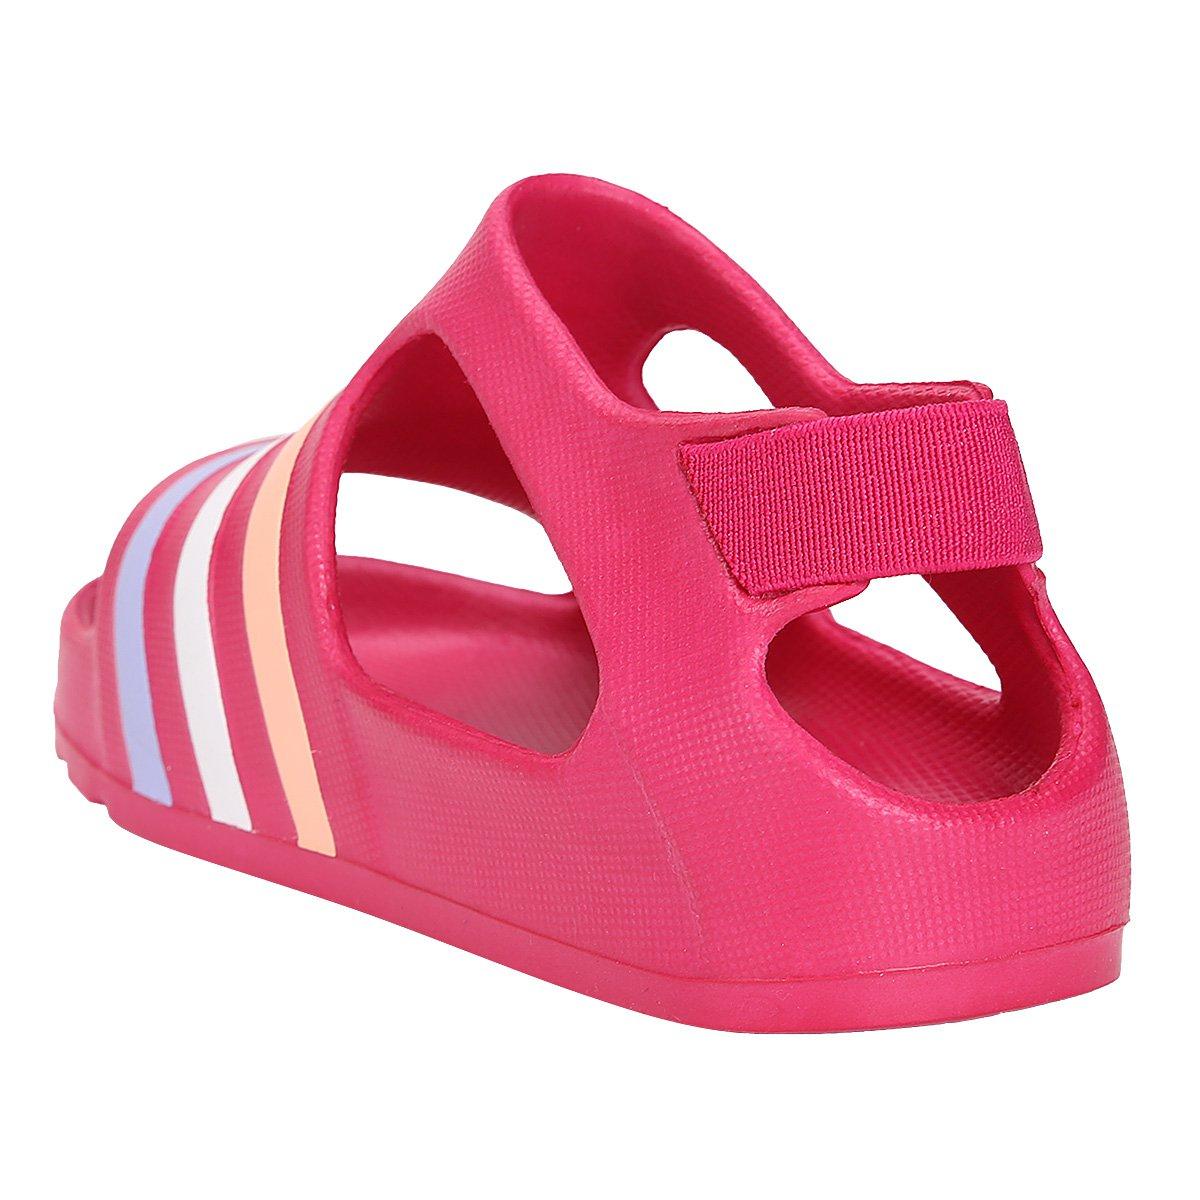 0786fa3c78e ... Sandália Adidas Adilette Play 1 Infantil - Pink+Rosa. OFERTAS  OPEC